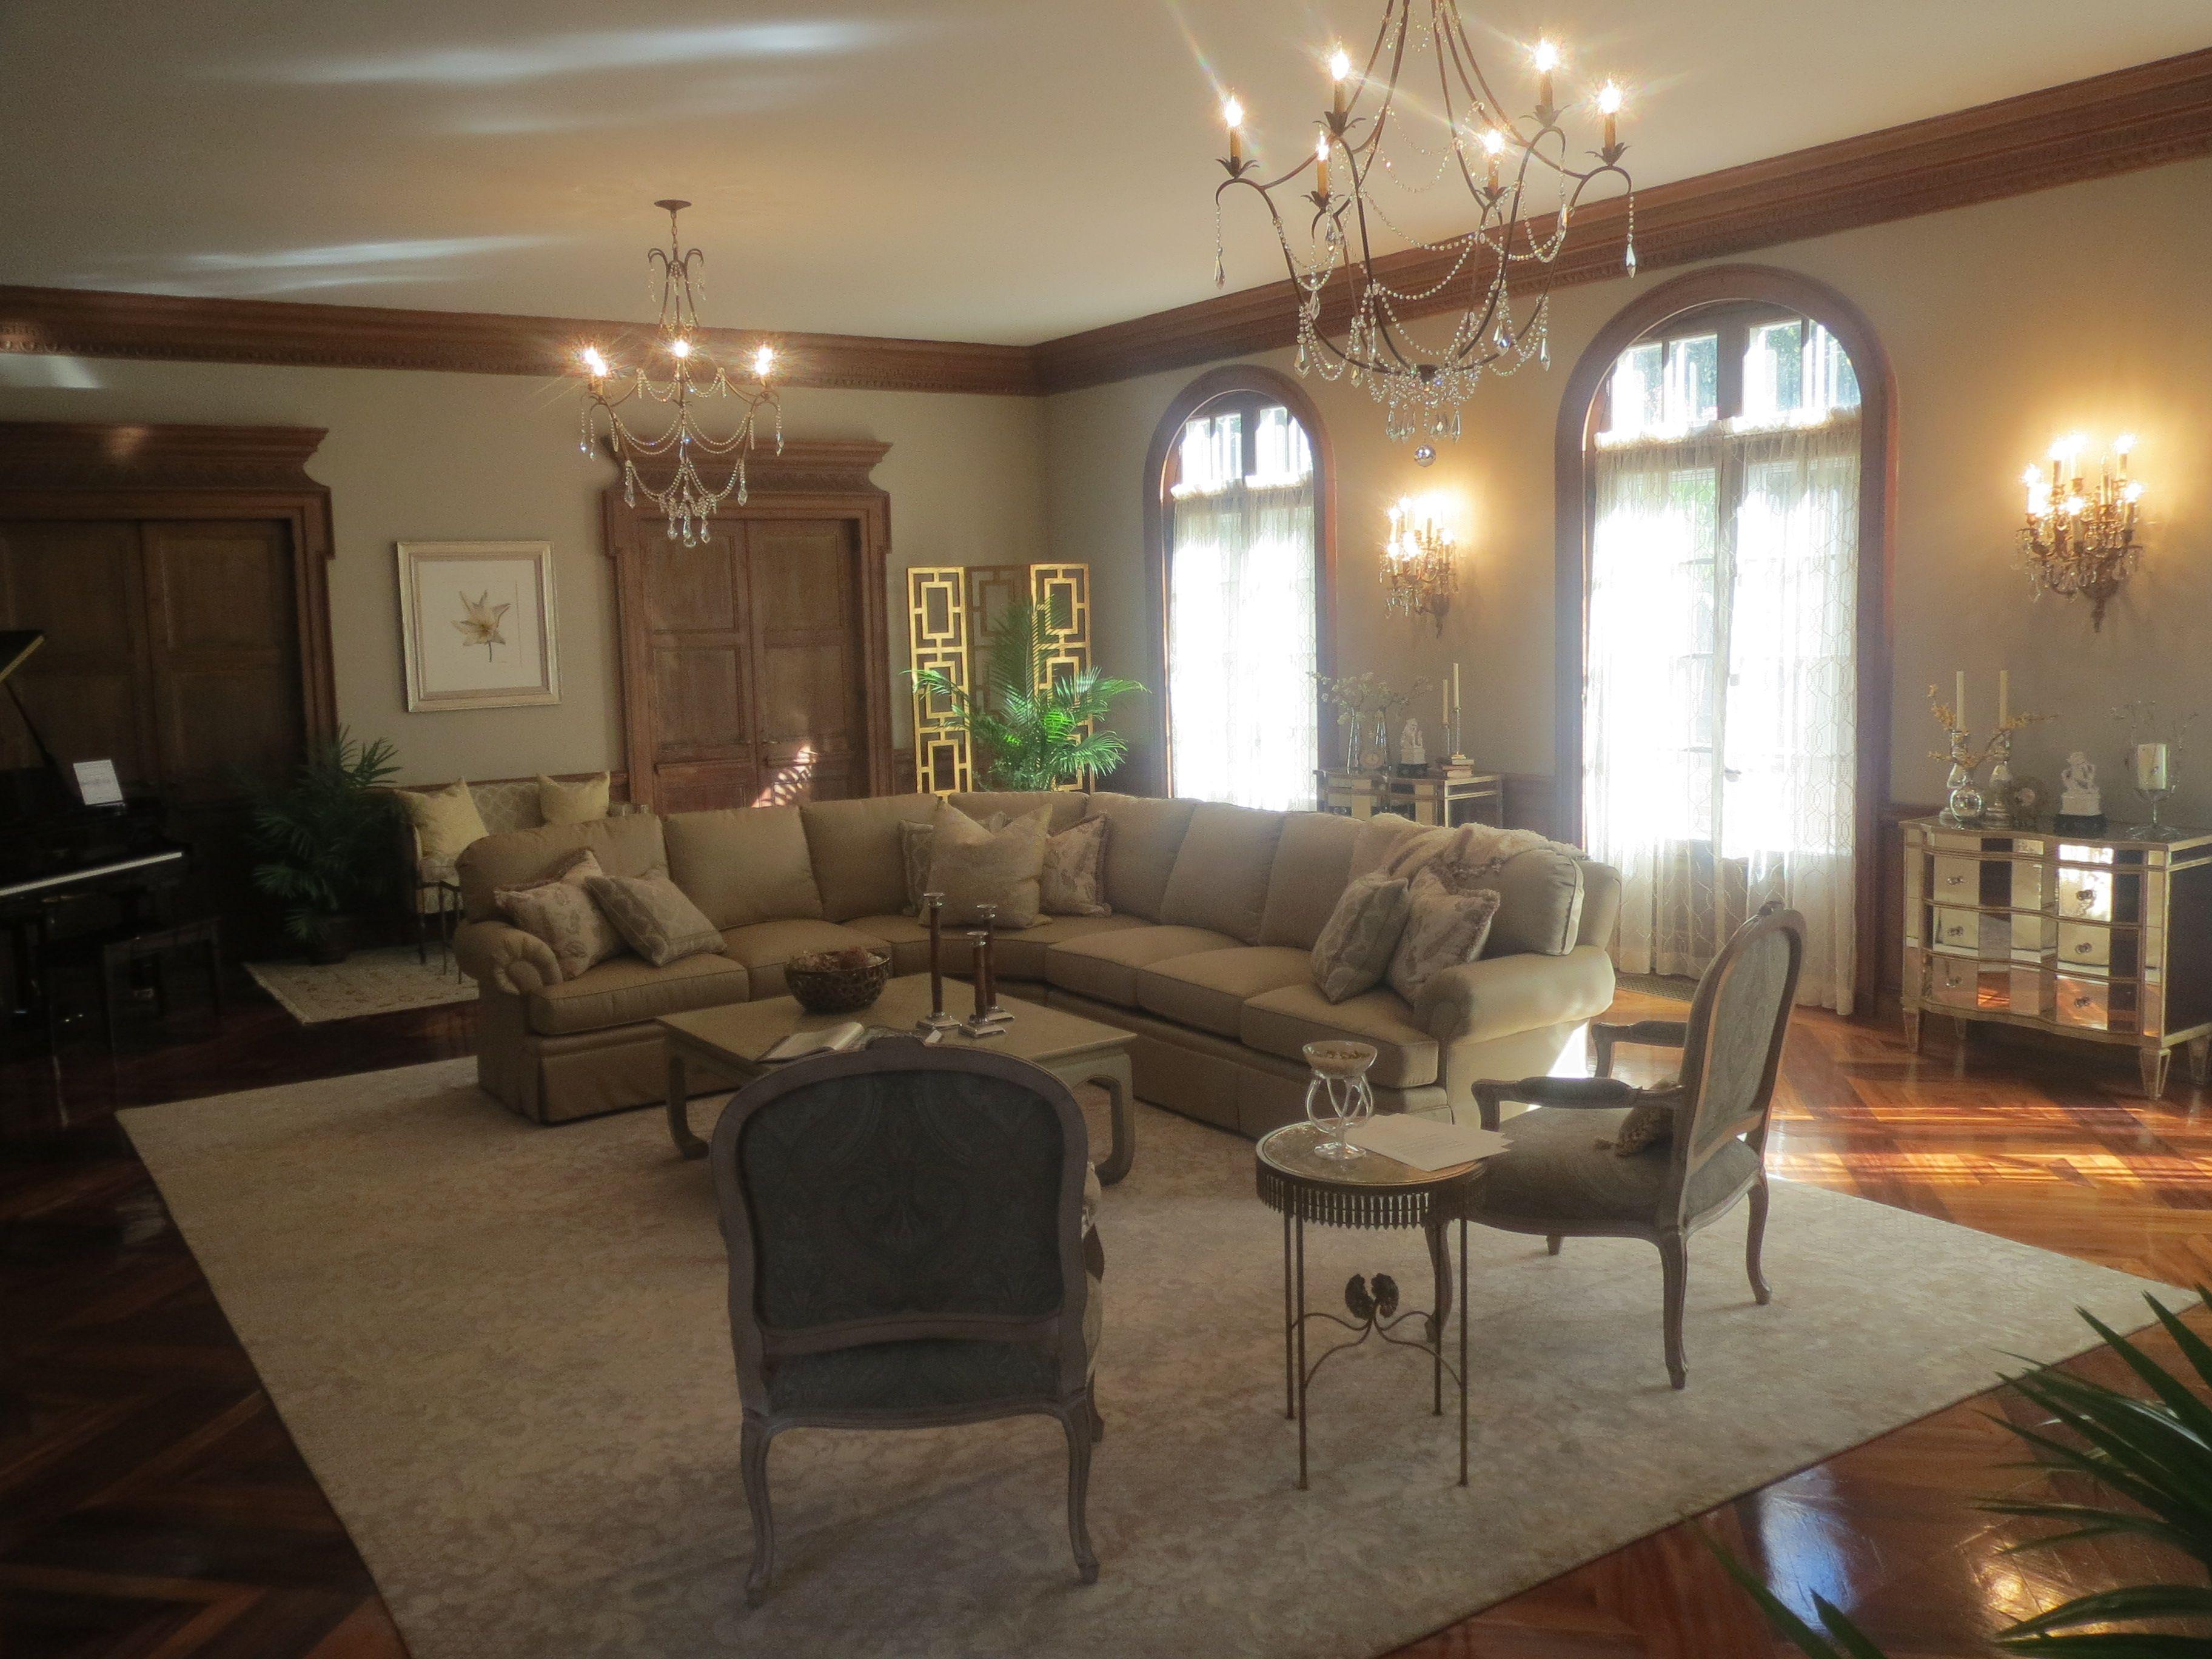 asid interior design. The Grand Ballroom By Jane Grucci Interior Design, Inc. Allied ASID Www.jgidesign Asid Design